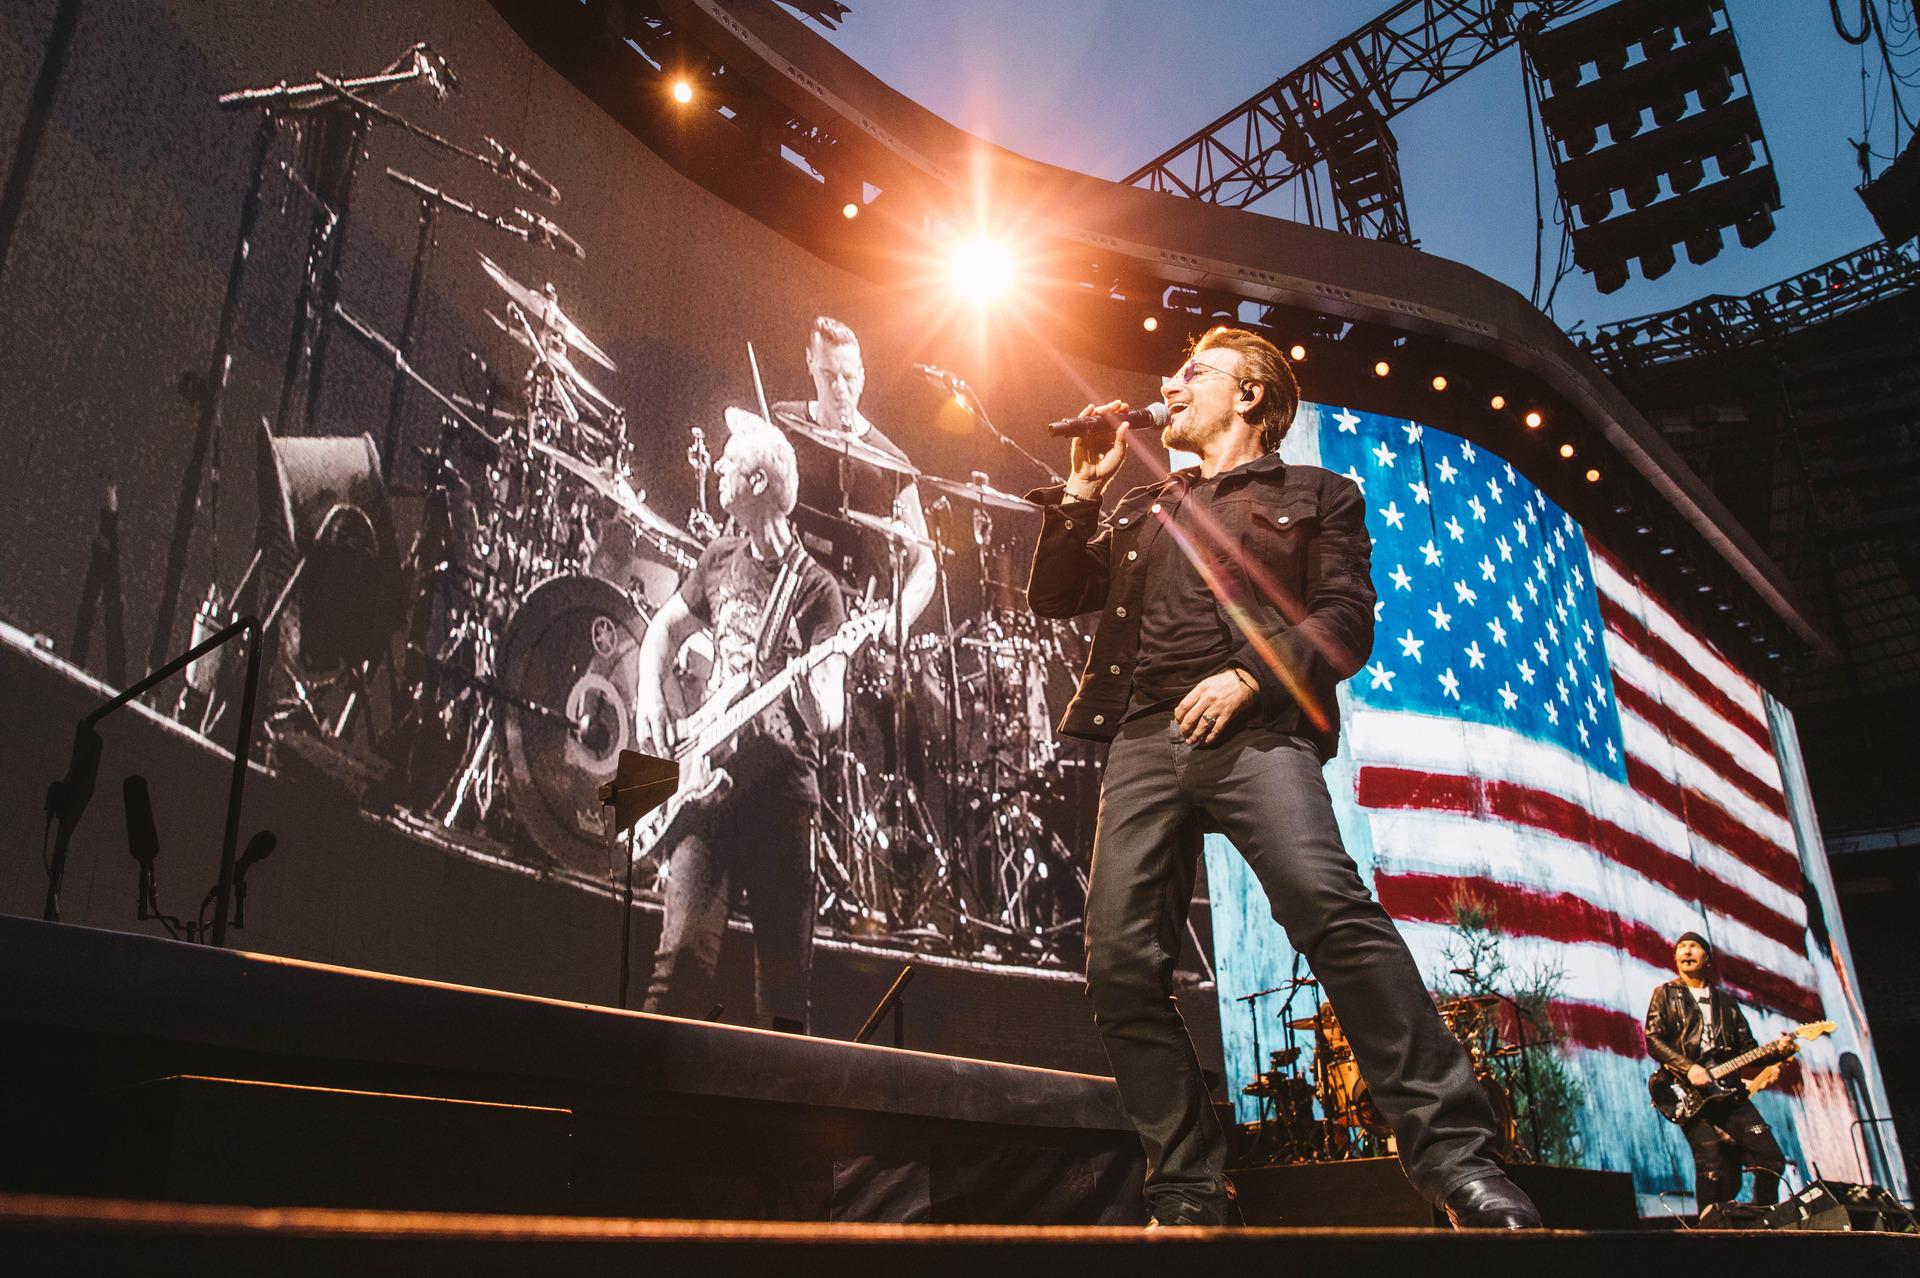 'Meditative experience': U2's Adam Clayton on Auckland concerts